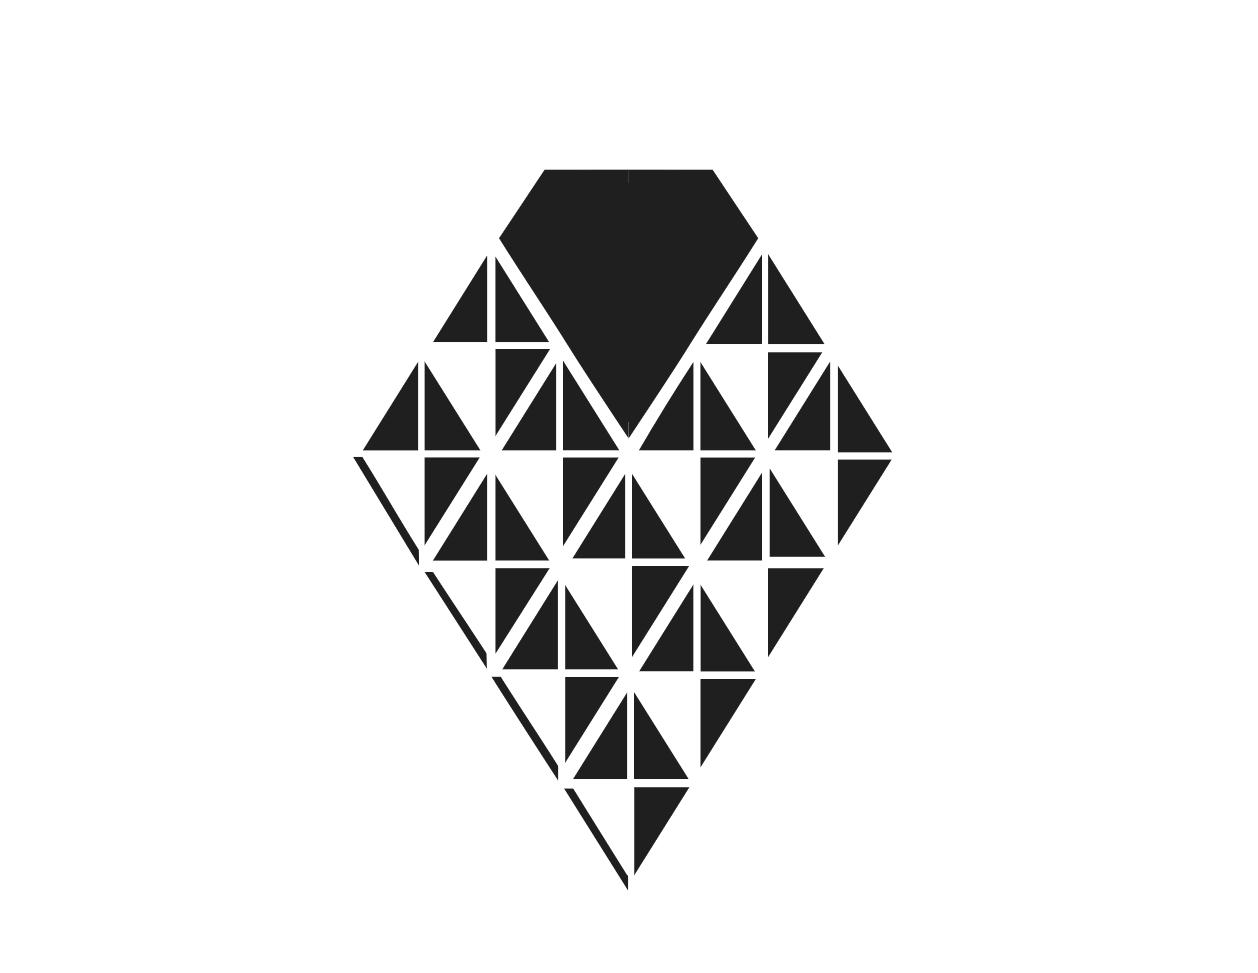 Lovian_käpy_logo_rajaus